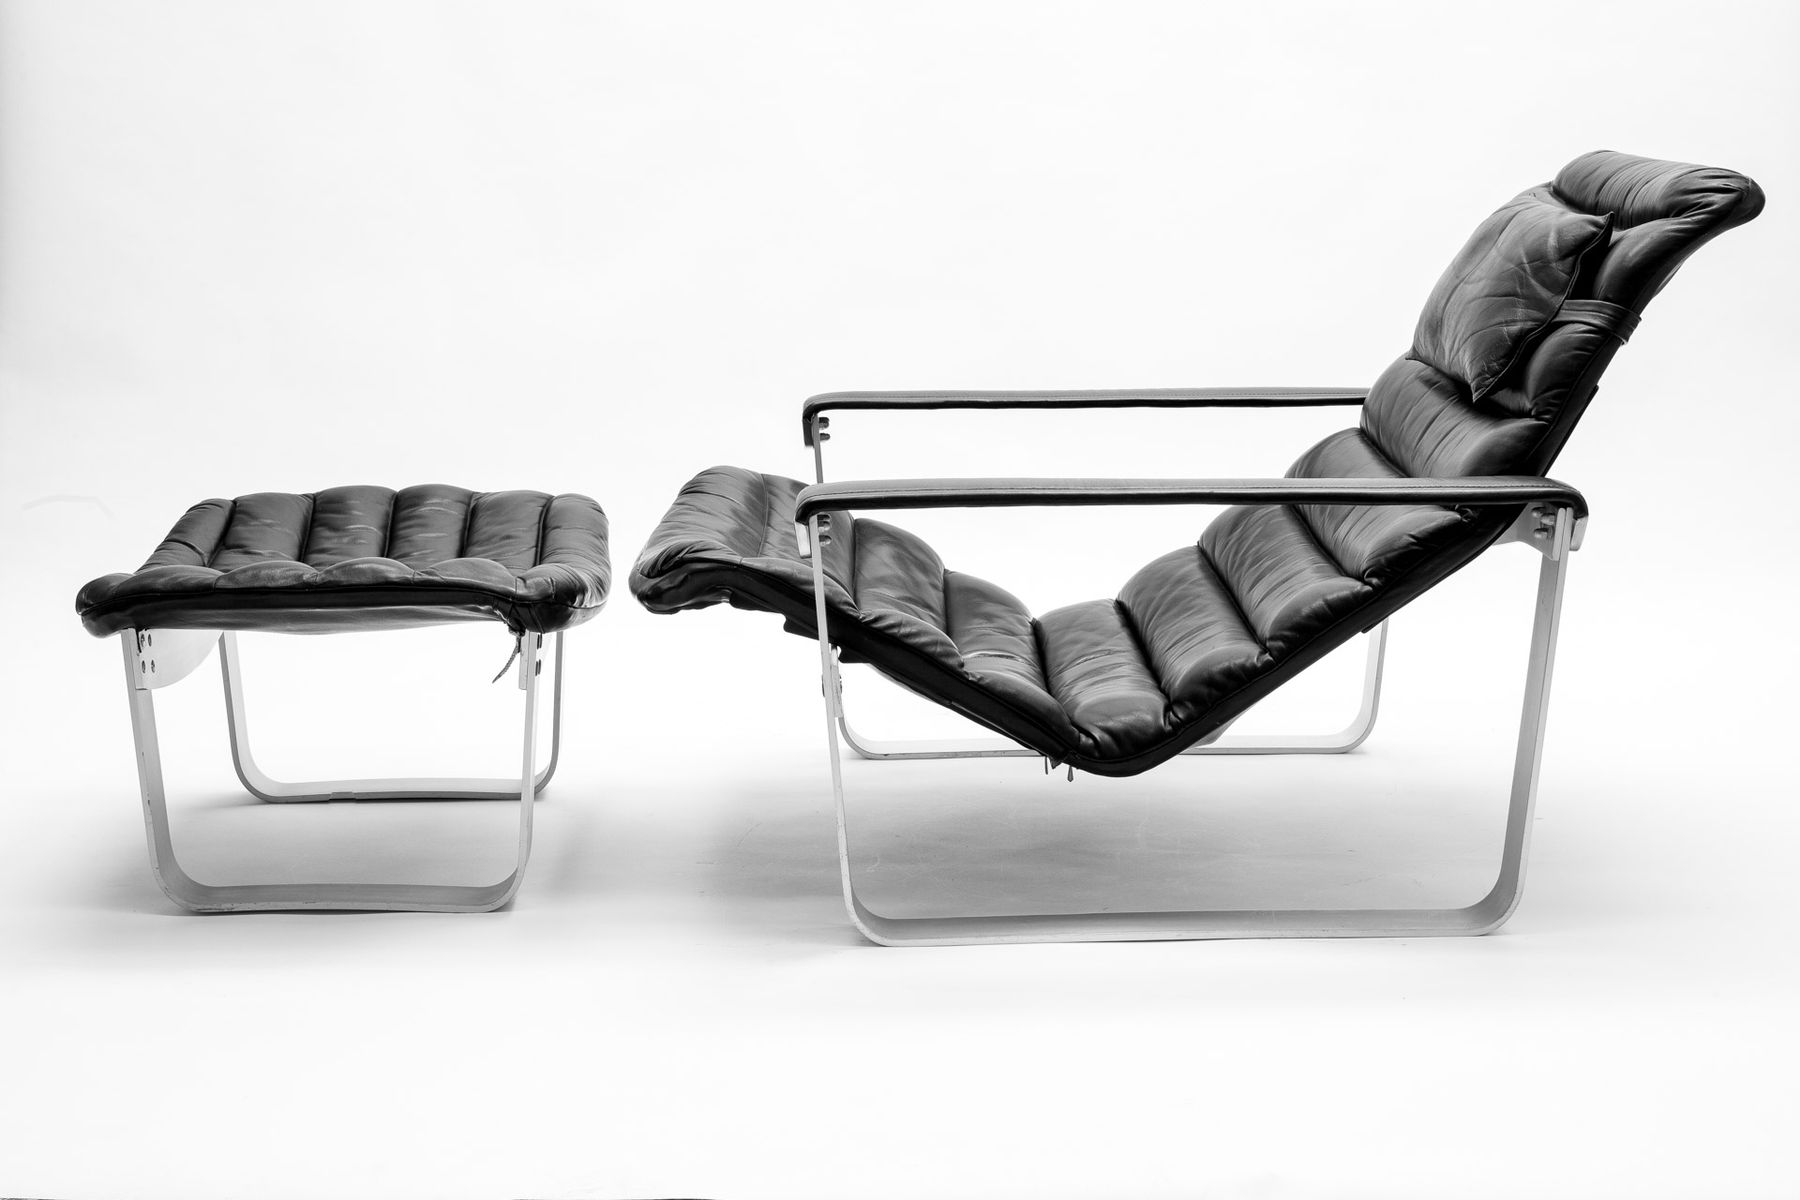 Finnish Pulkka Lounge Chair With Foot Stool By Ilmari Lappalainen For Asko,  1968